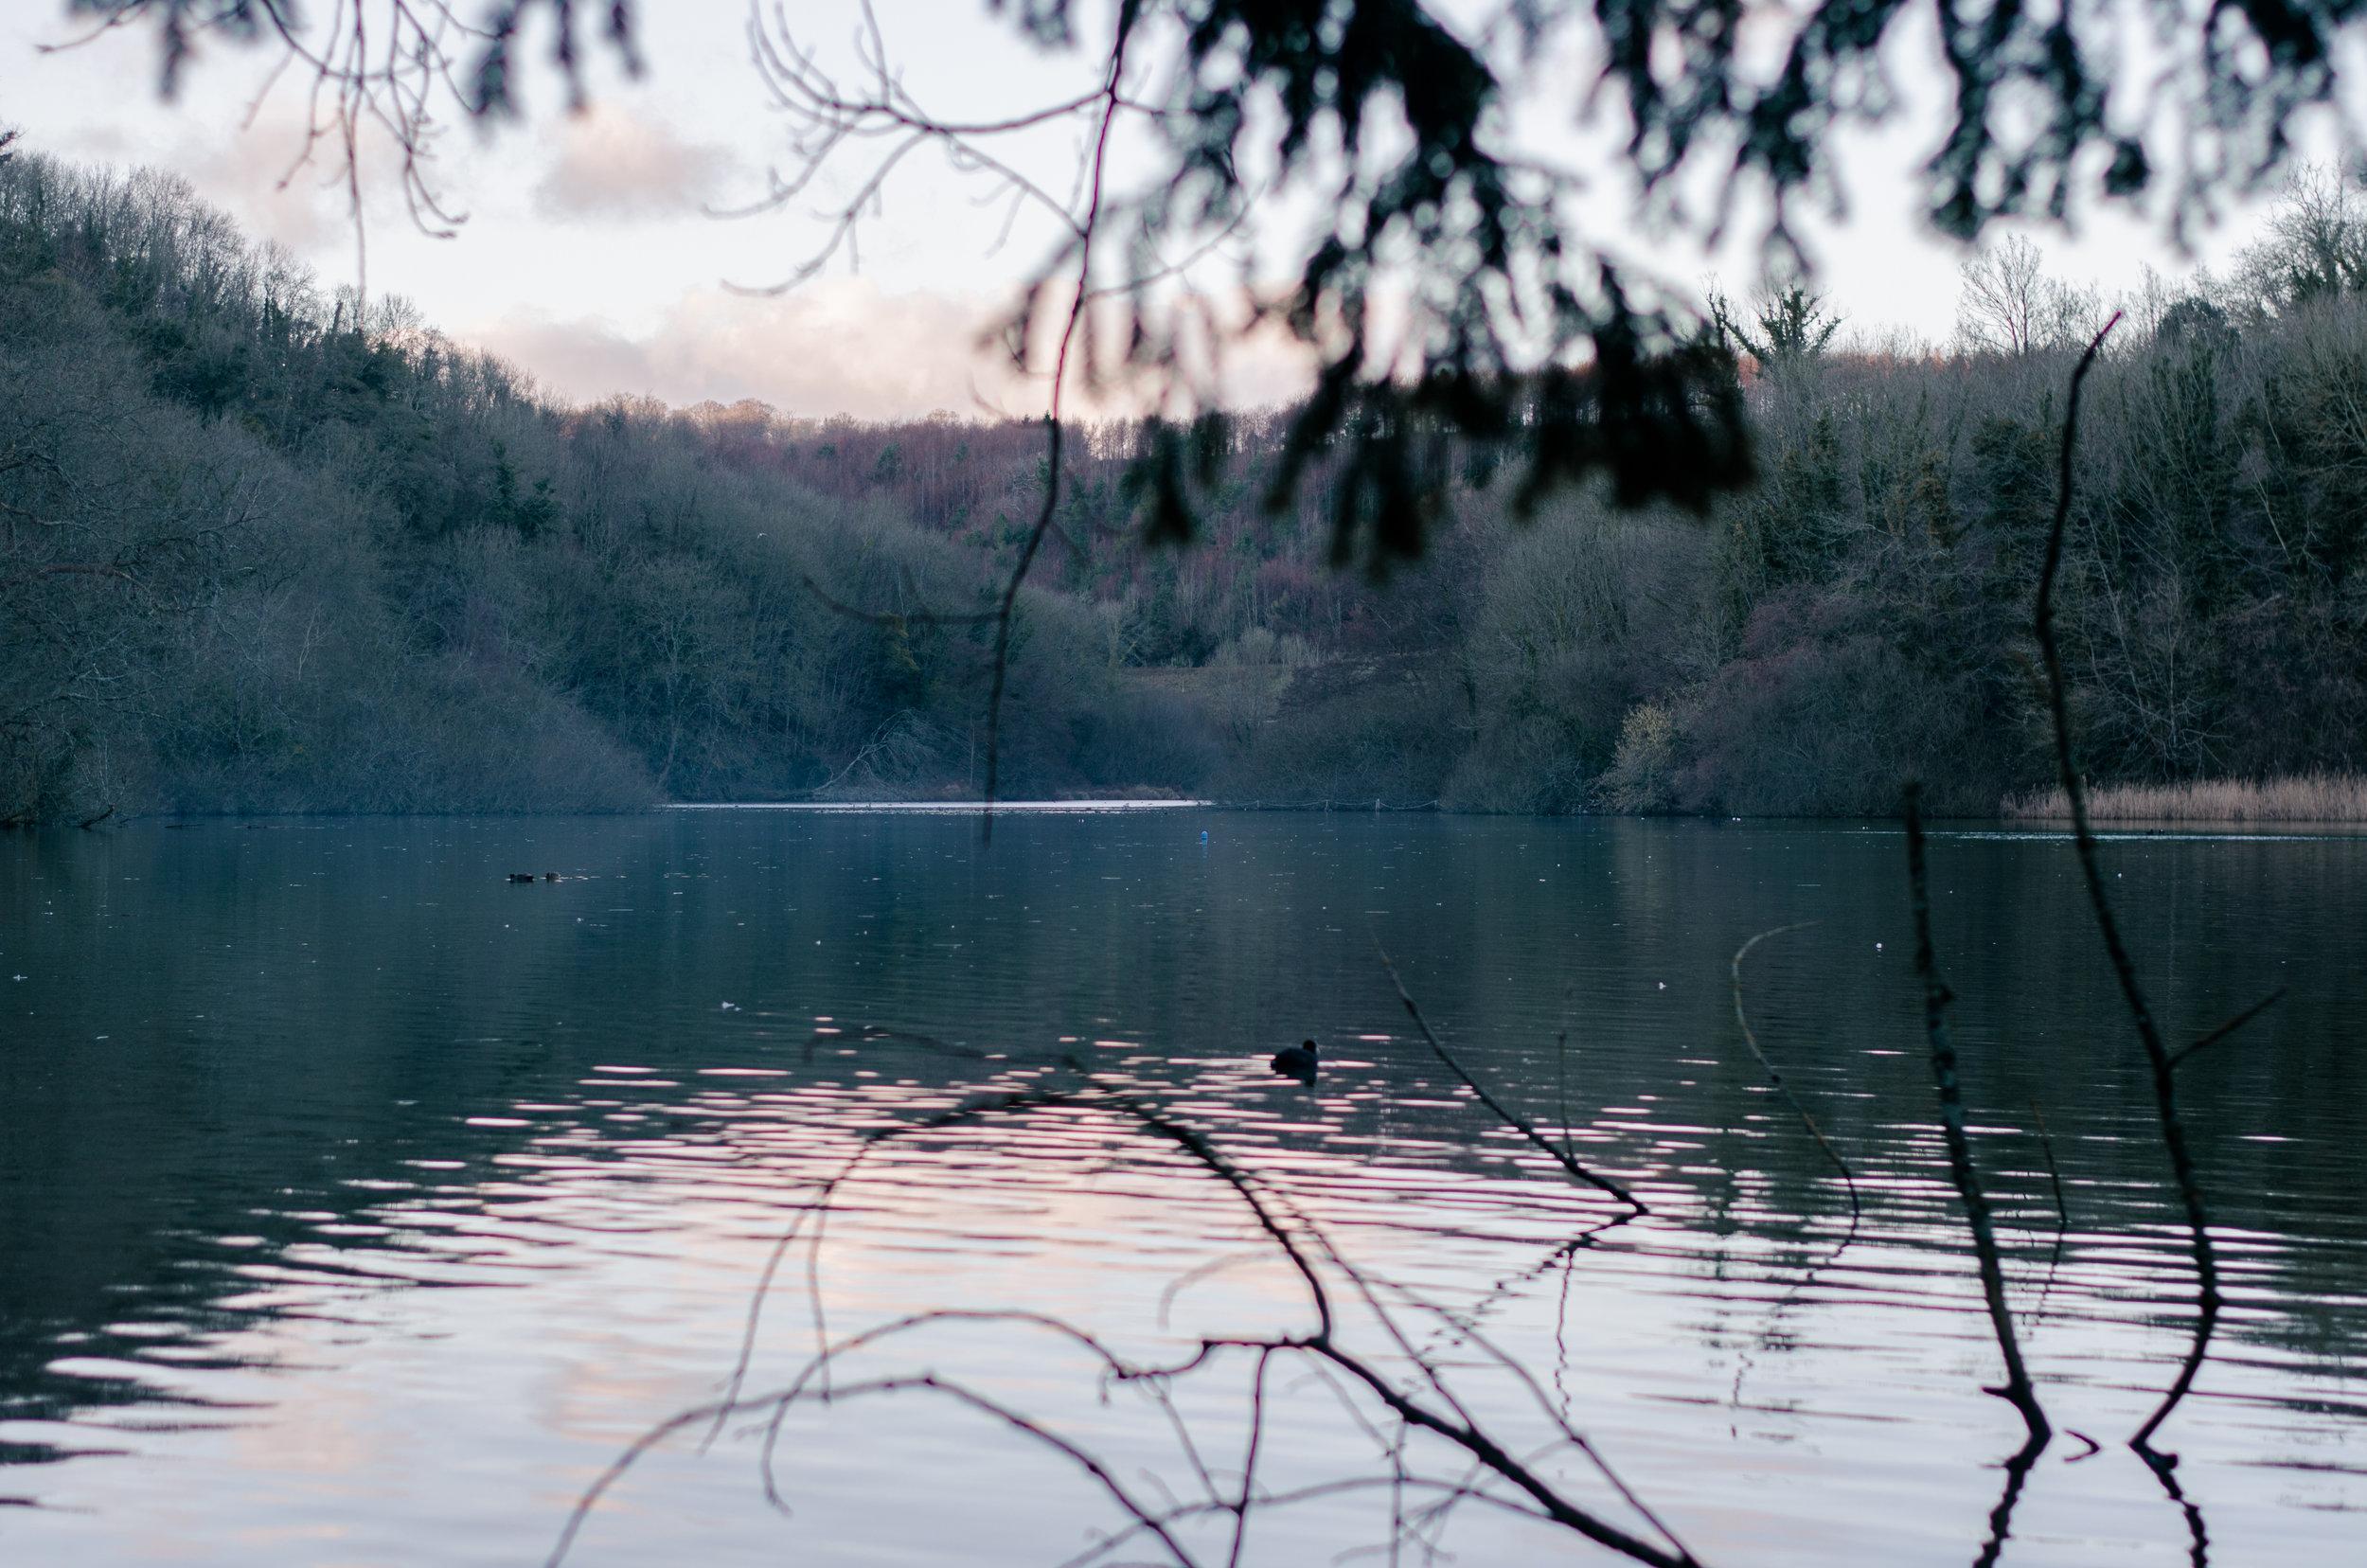 Arundel - Aiste Saulyte Photography - 2018-01-05-71.jpg